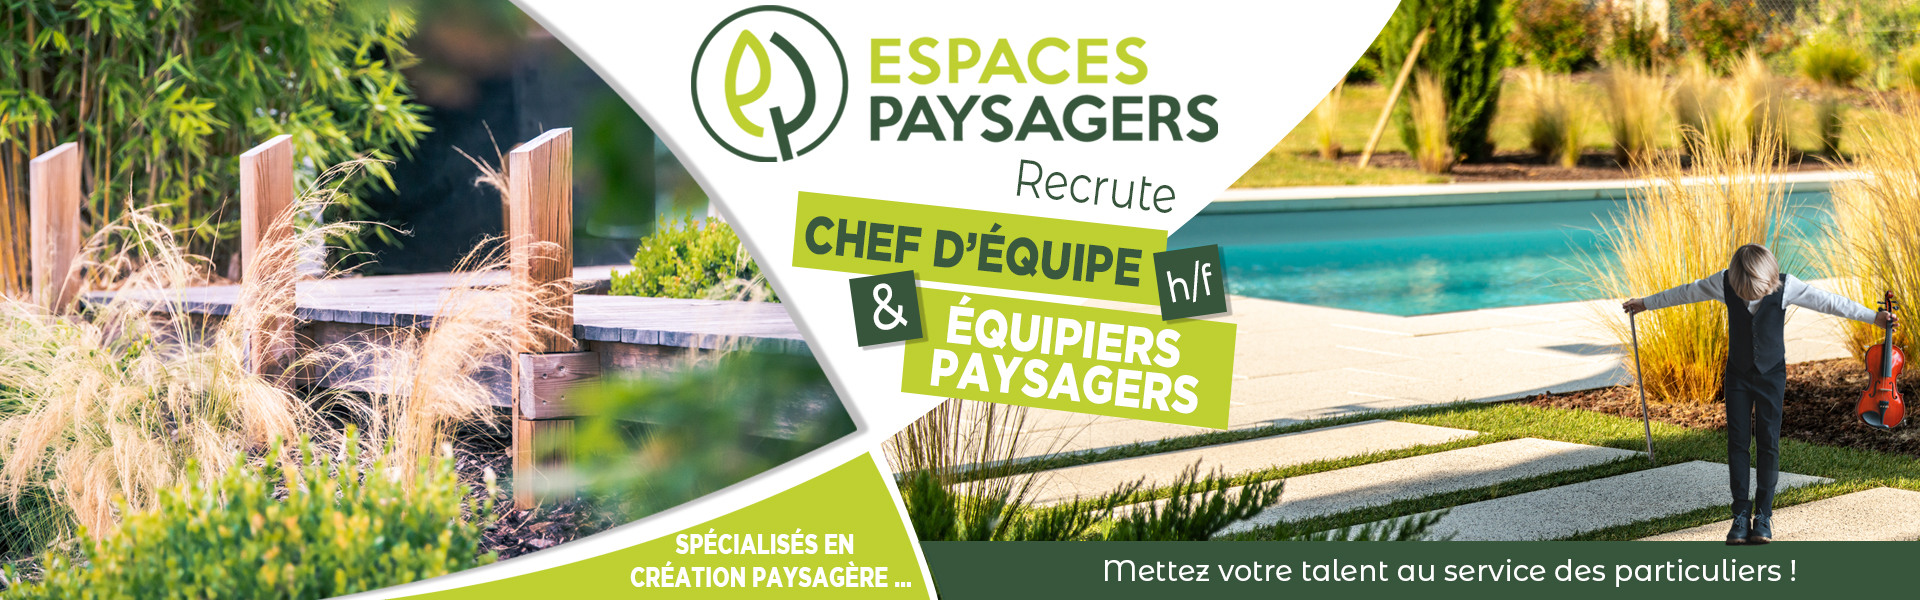 recrutement paysagiste - recrutement espace vert - offre d'emploi paysagiste - offre d'emploi espace vert